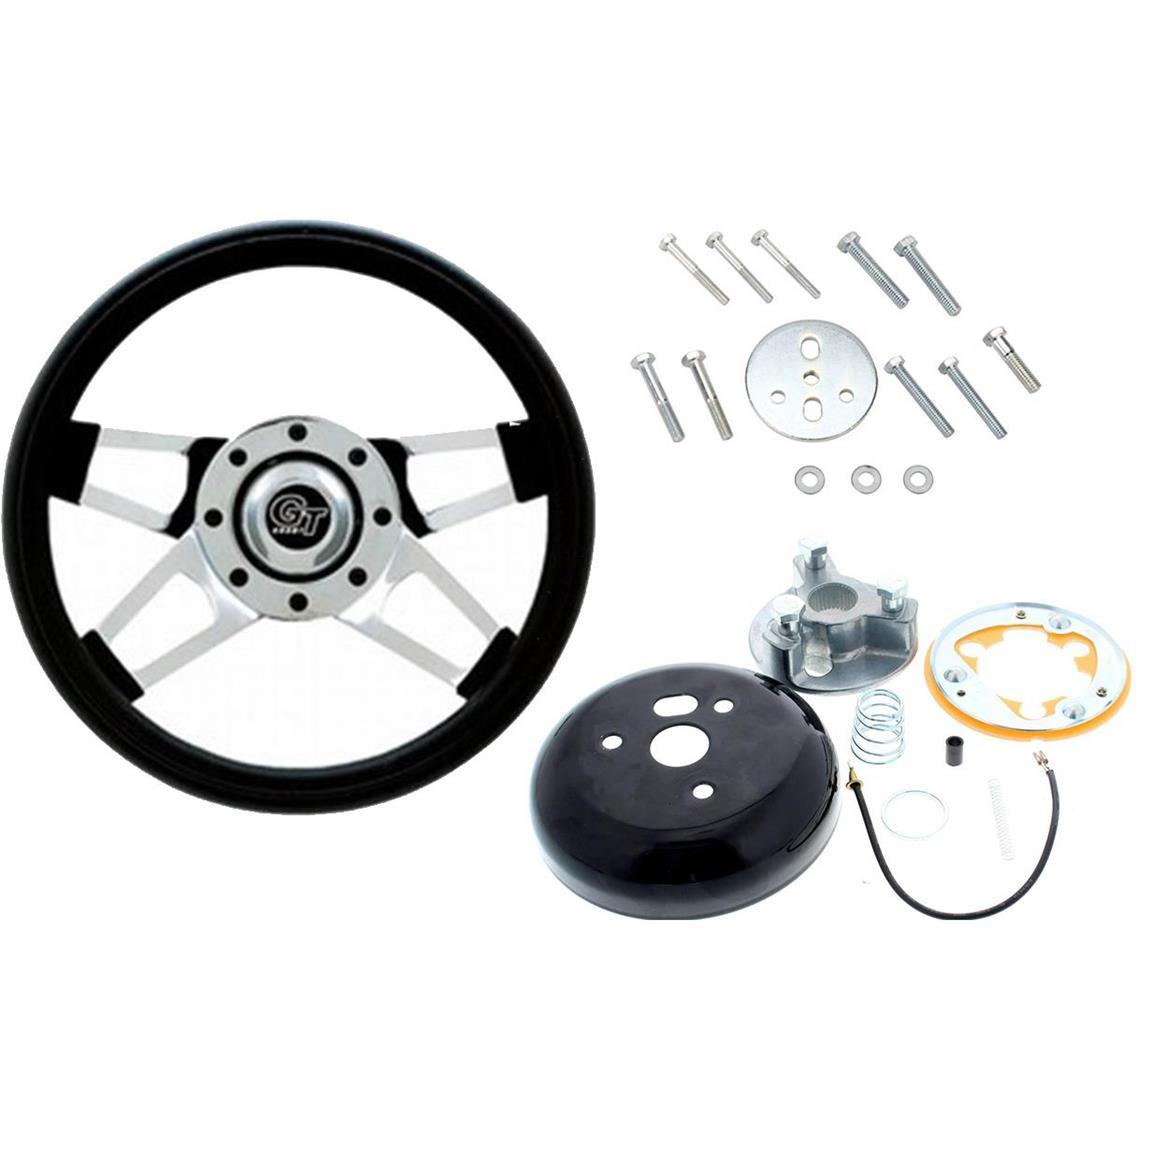 Grant 440 Challenger Gt Steering Wheel 13 1 2 Inch W Install Kit